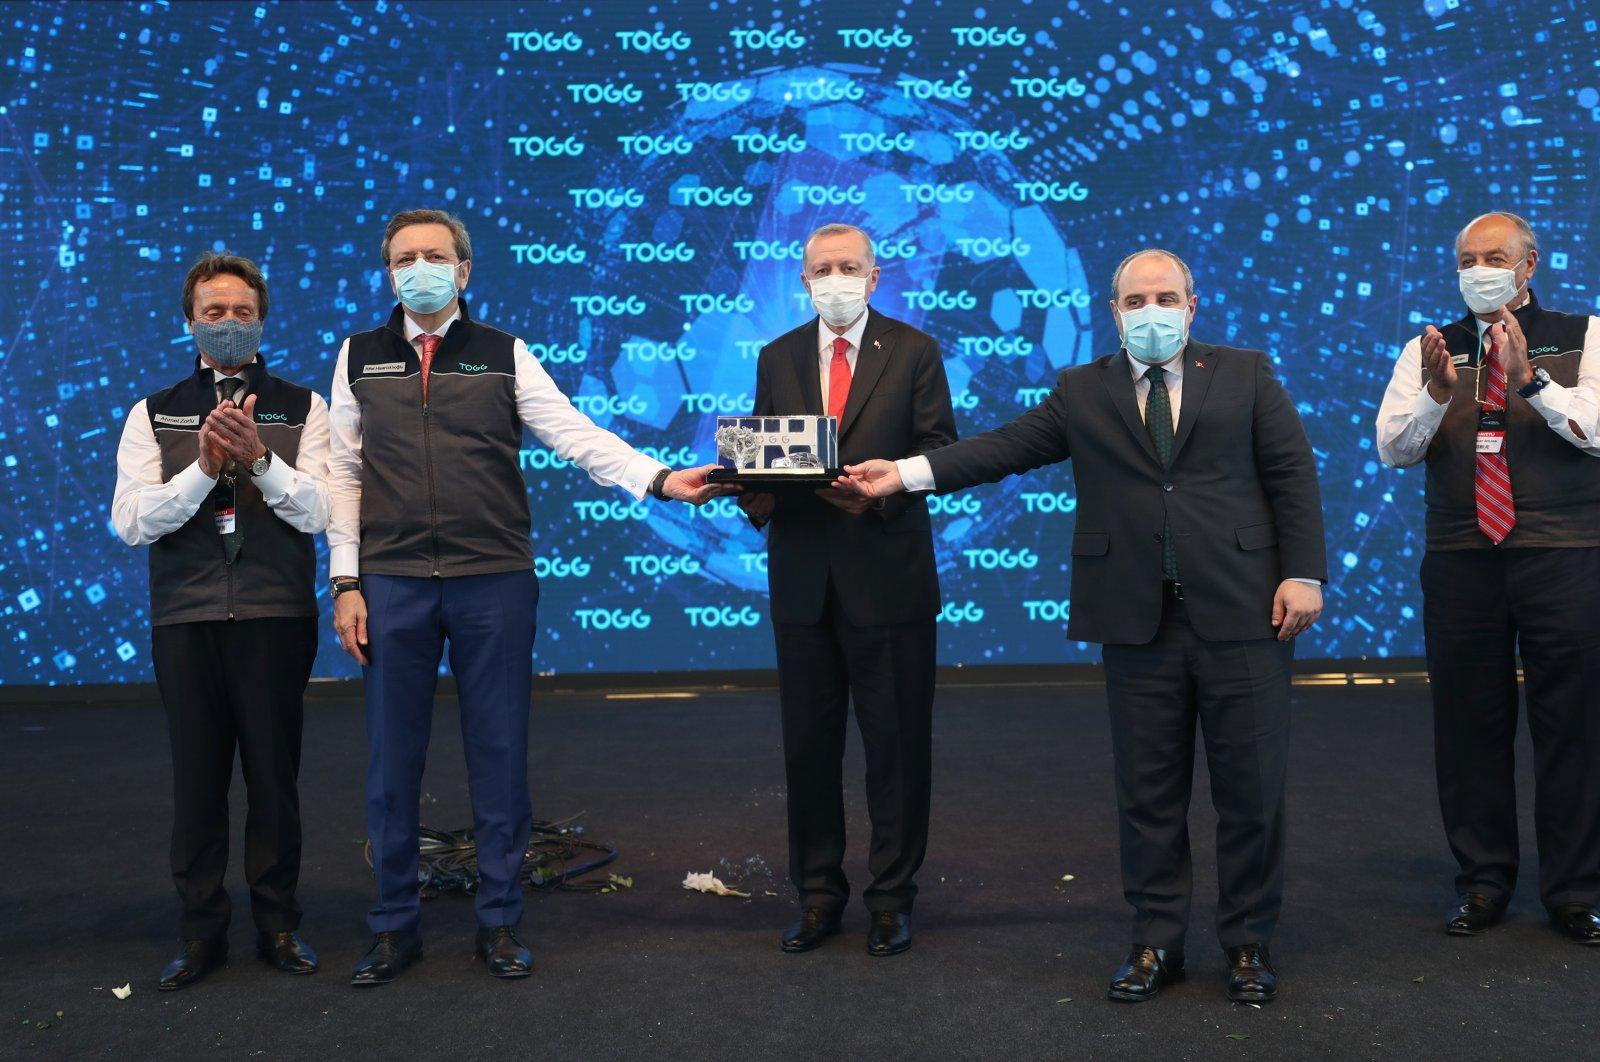 President Recep Tayyip Erdoğan (C) at the groundbreaking ceremony for Turkey's first domestic car factory in the Gemlik district of northwestern Bursa province, July 18, 2020. (AA Photo)